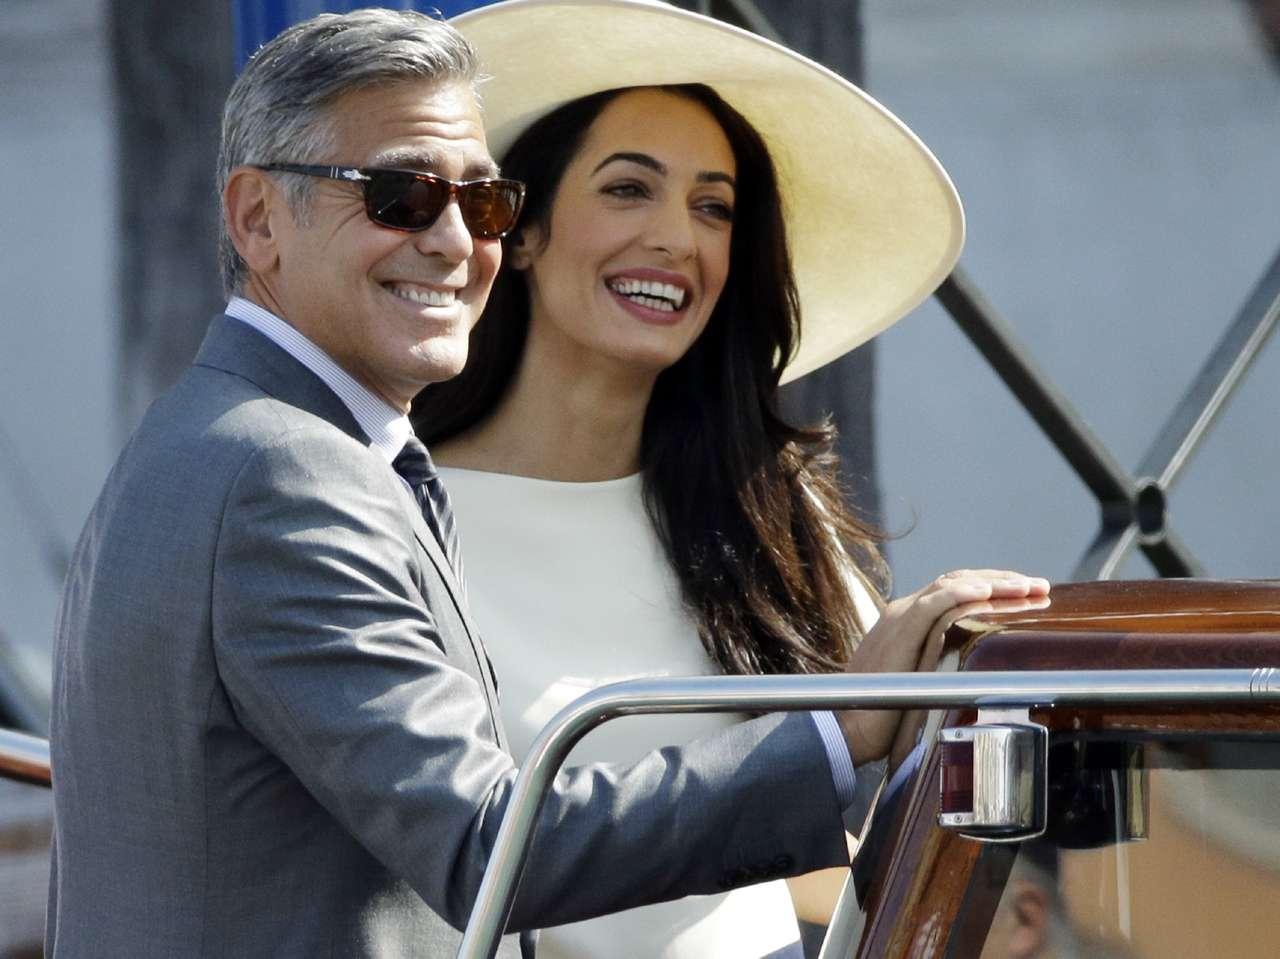 George Clooney y Amal Alamuddin. Foto: AP en español